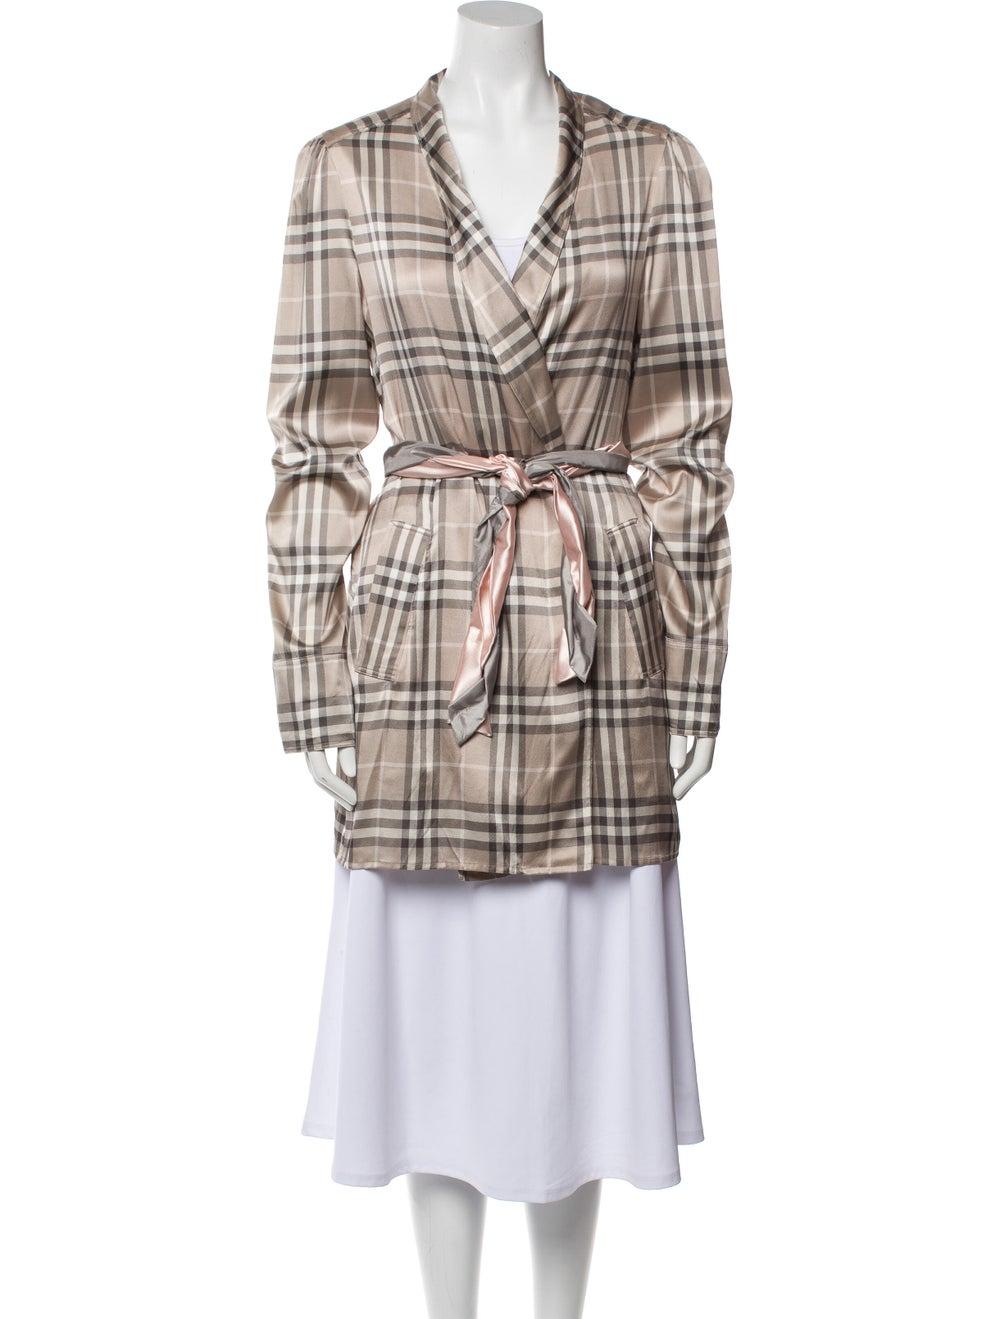 Burberry Silk Plaid Print Robe - image 1